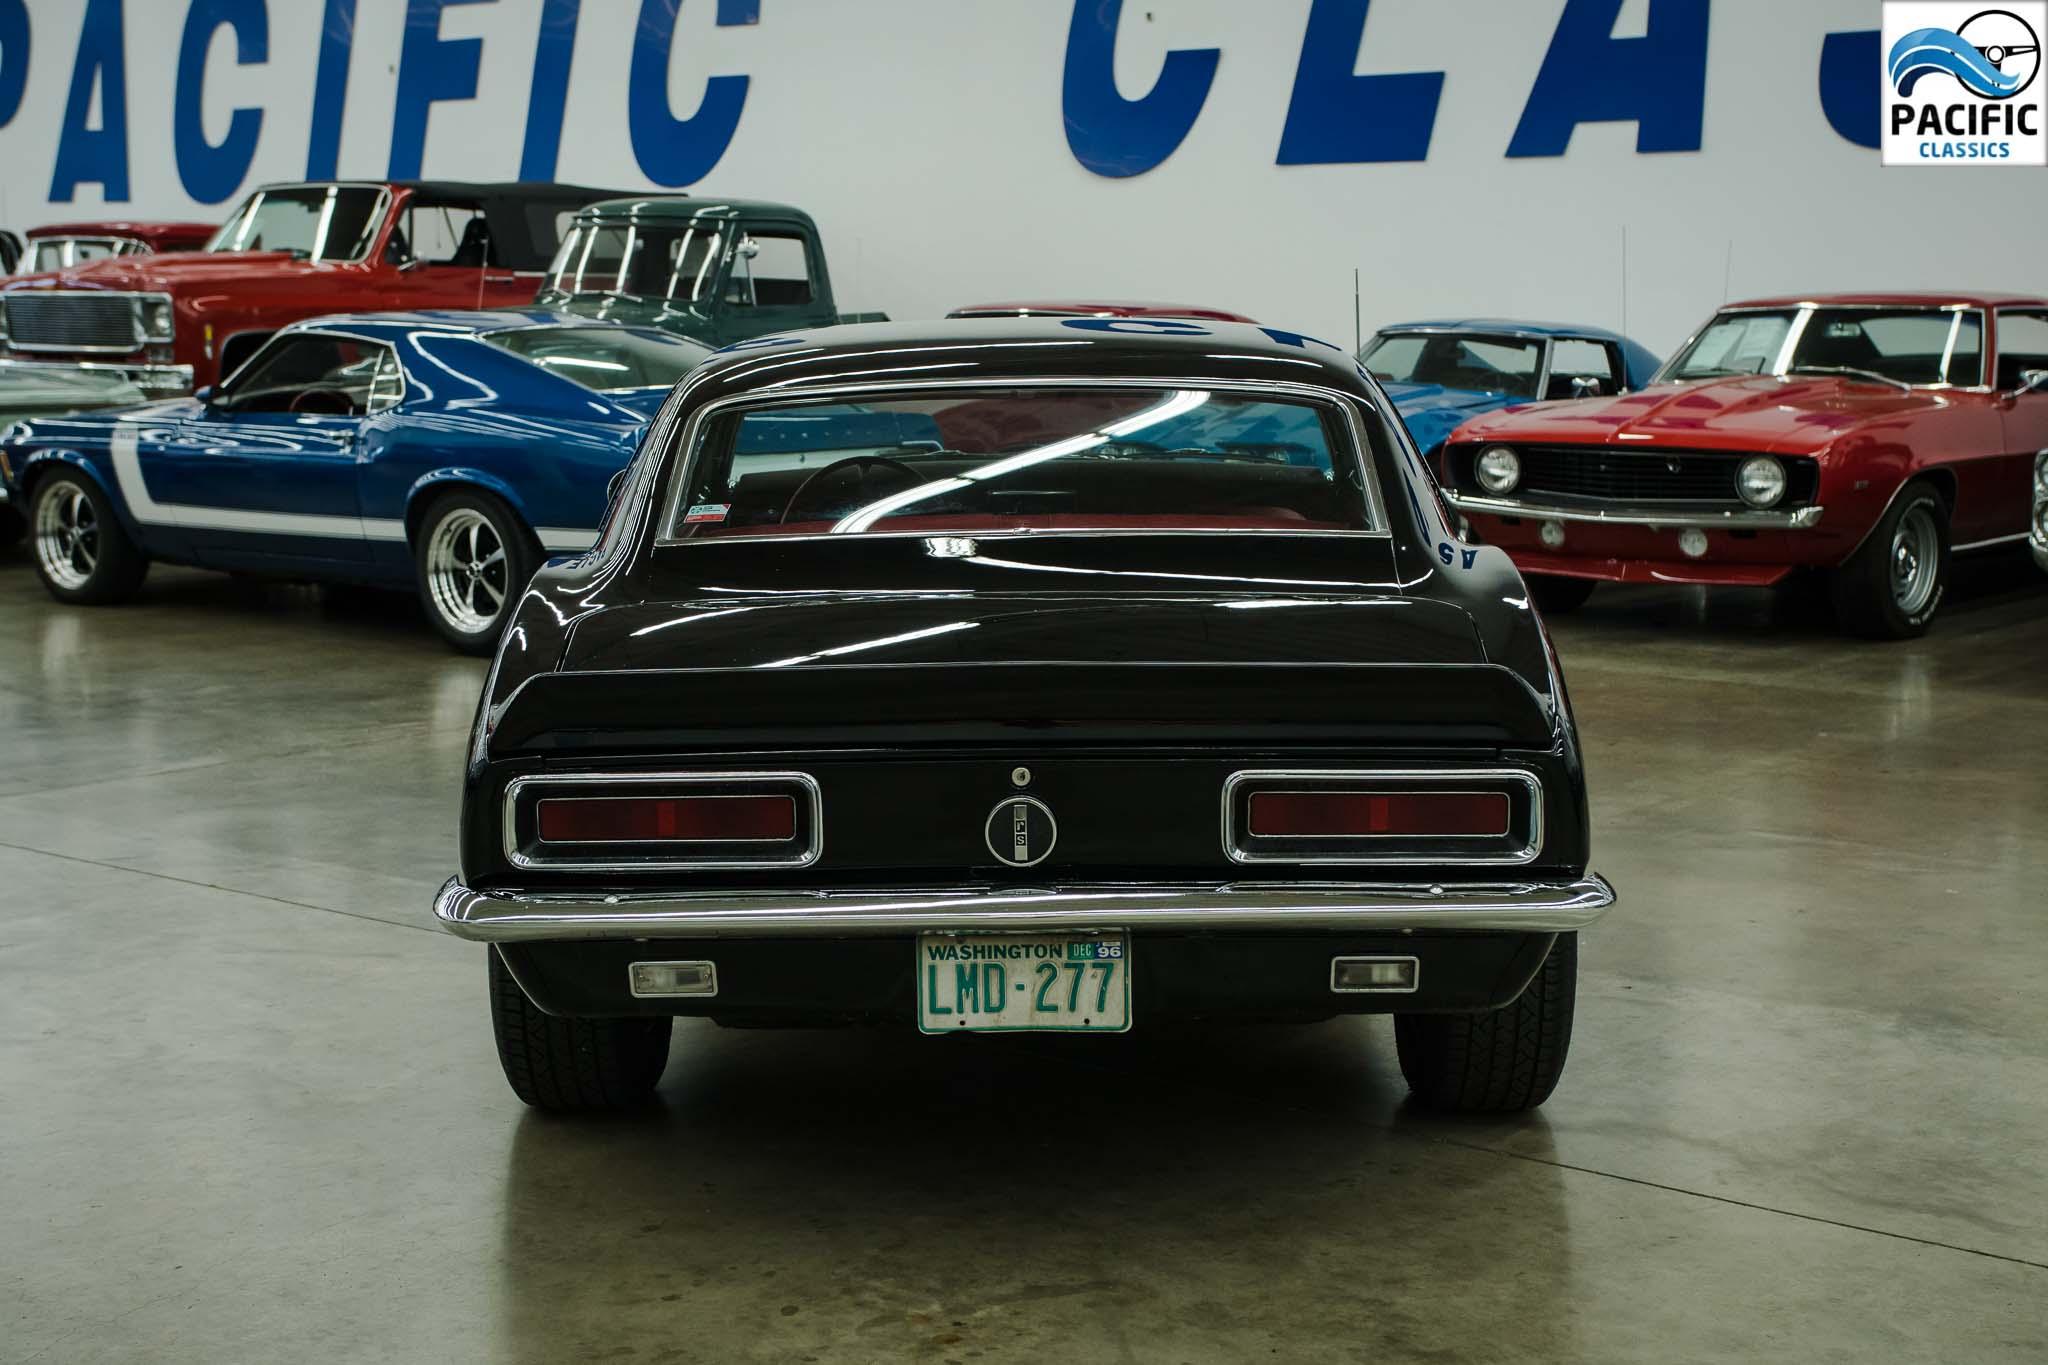 1967 Chevrolet Rally Sport Camaro